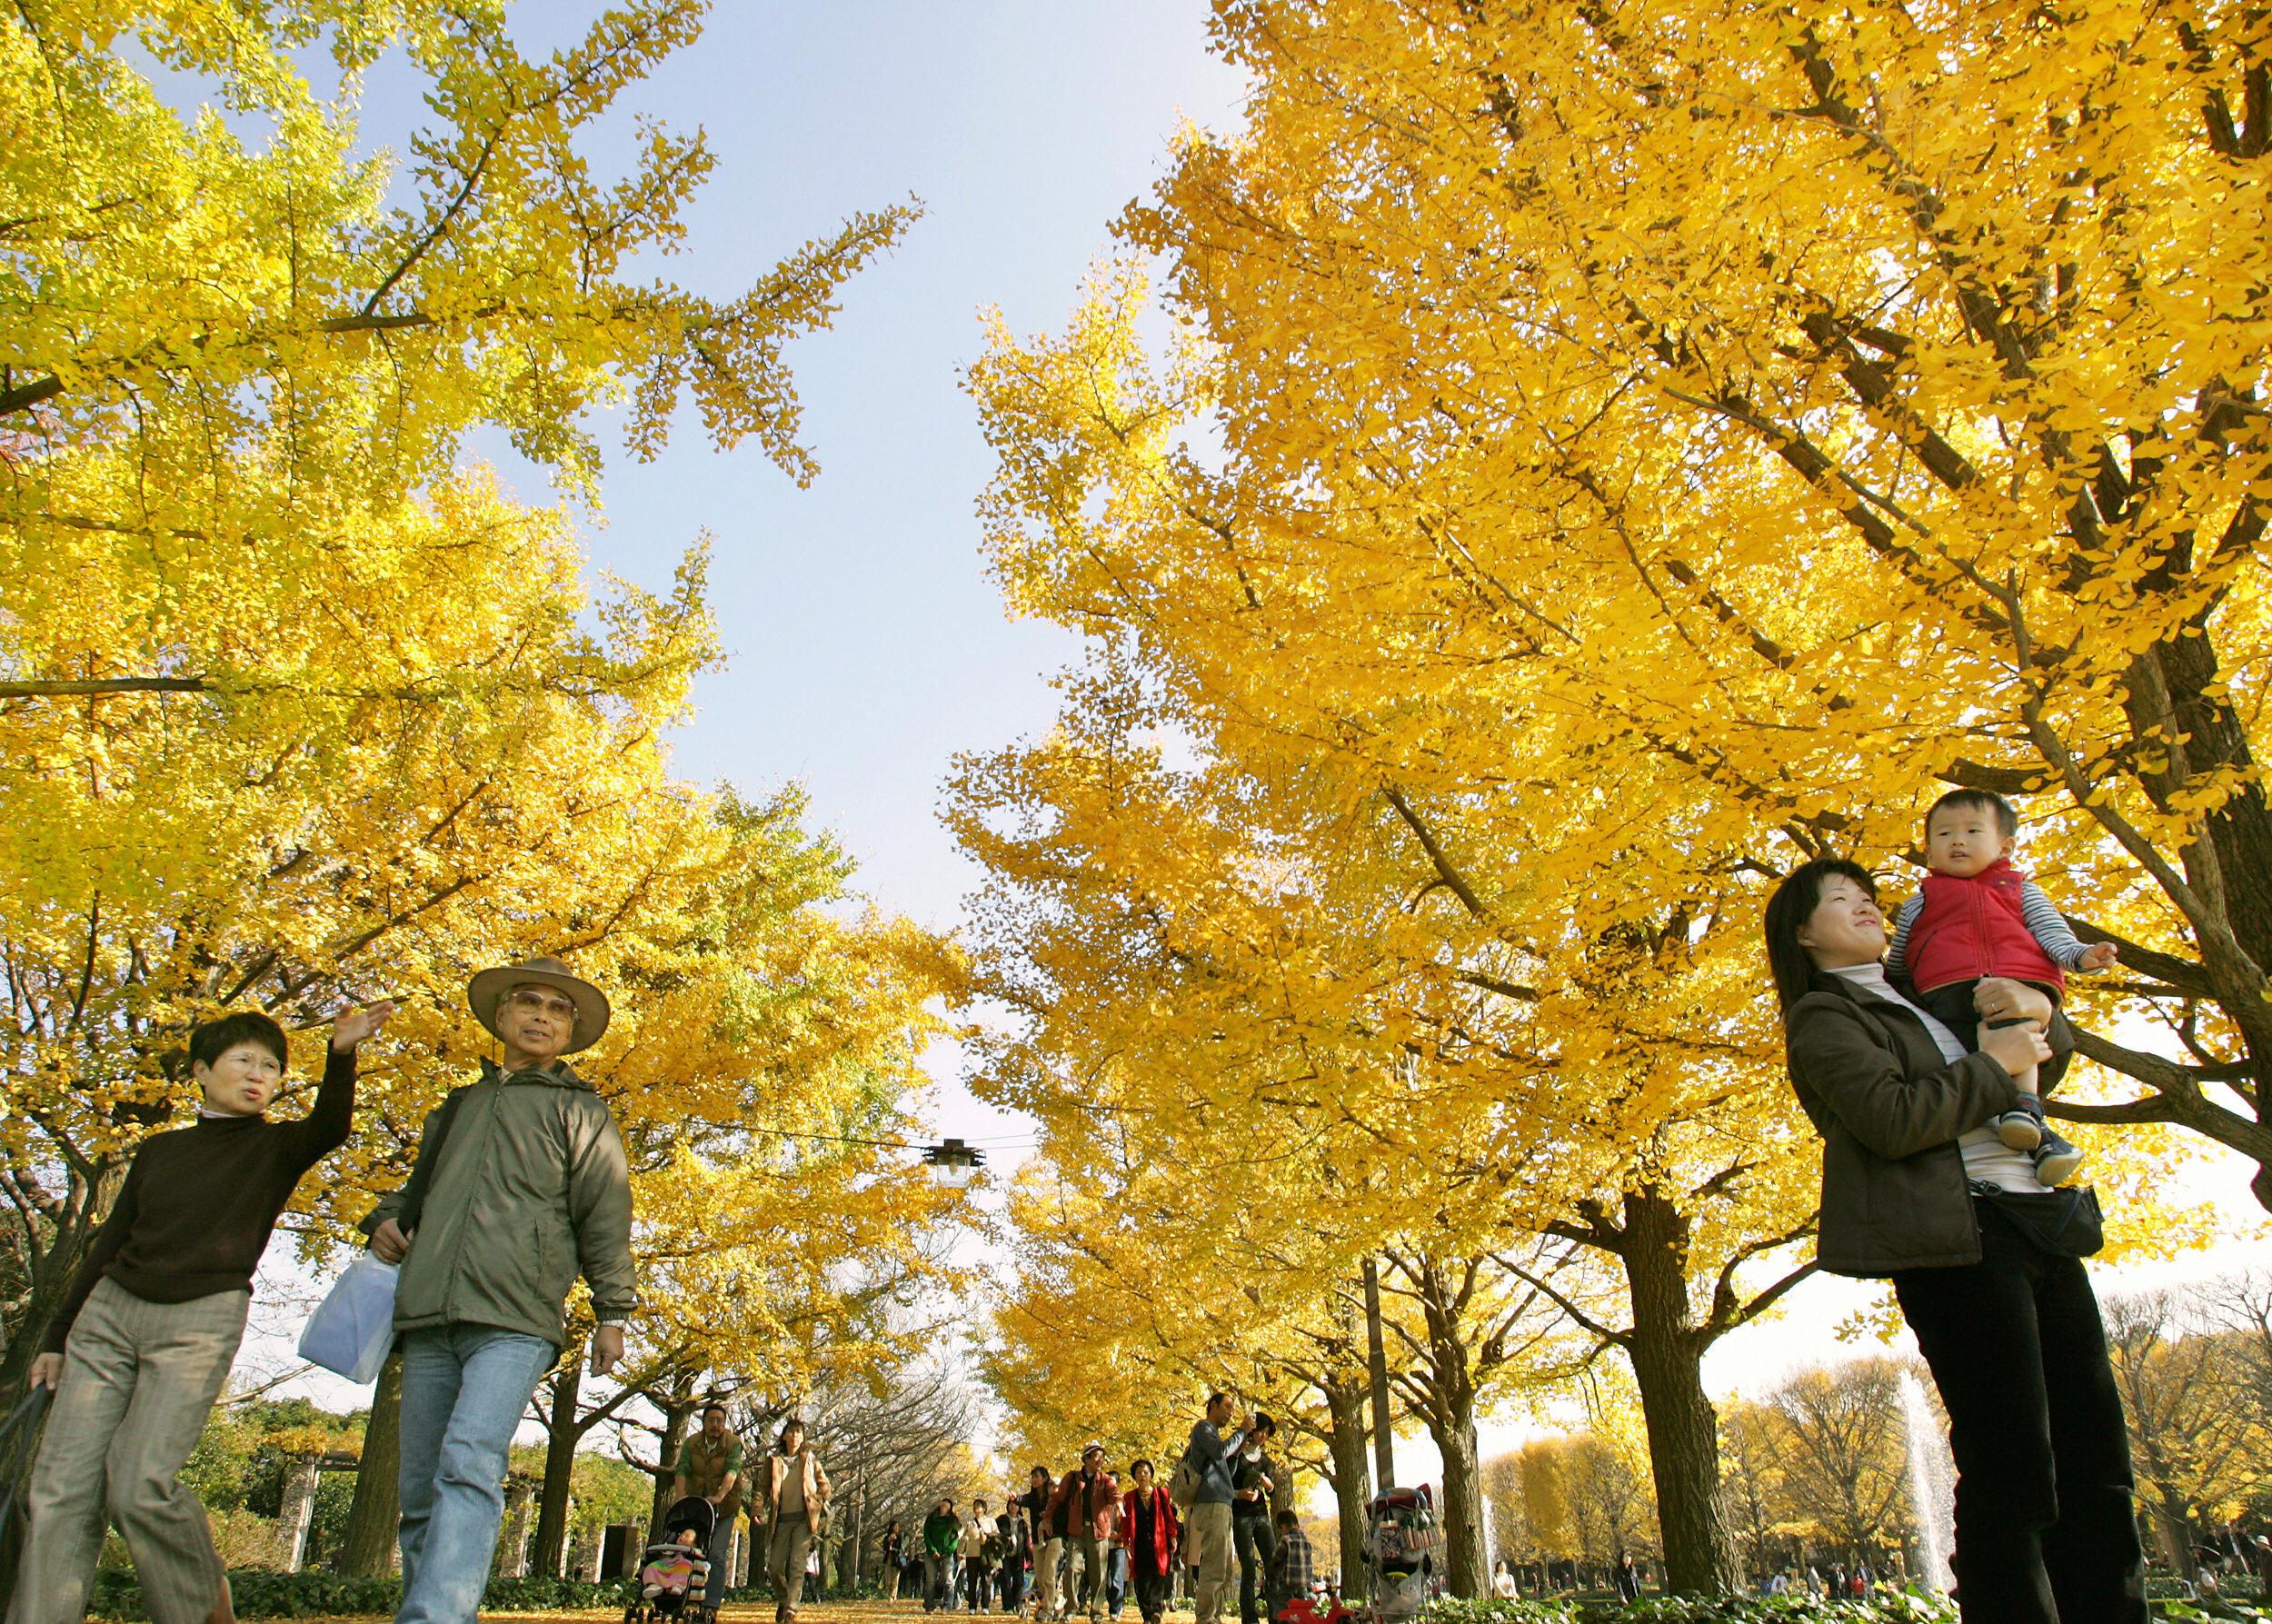 People take a stroll under ginkgo yellow